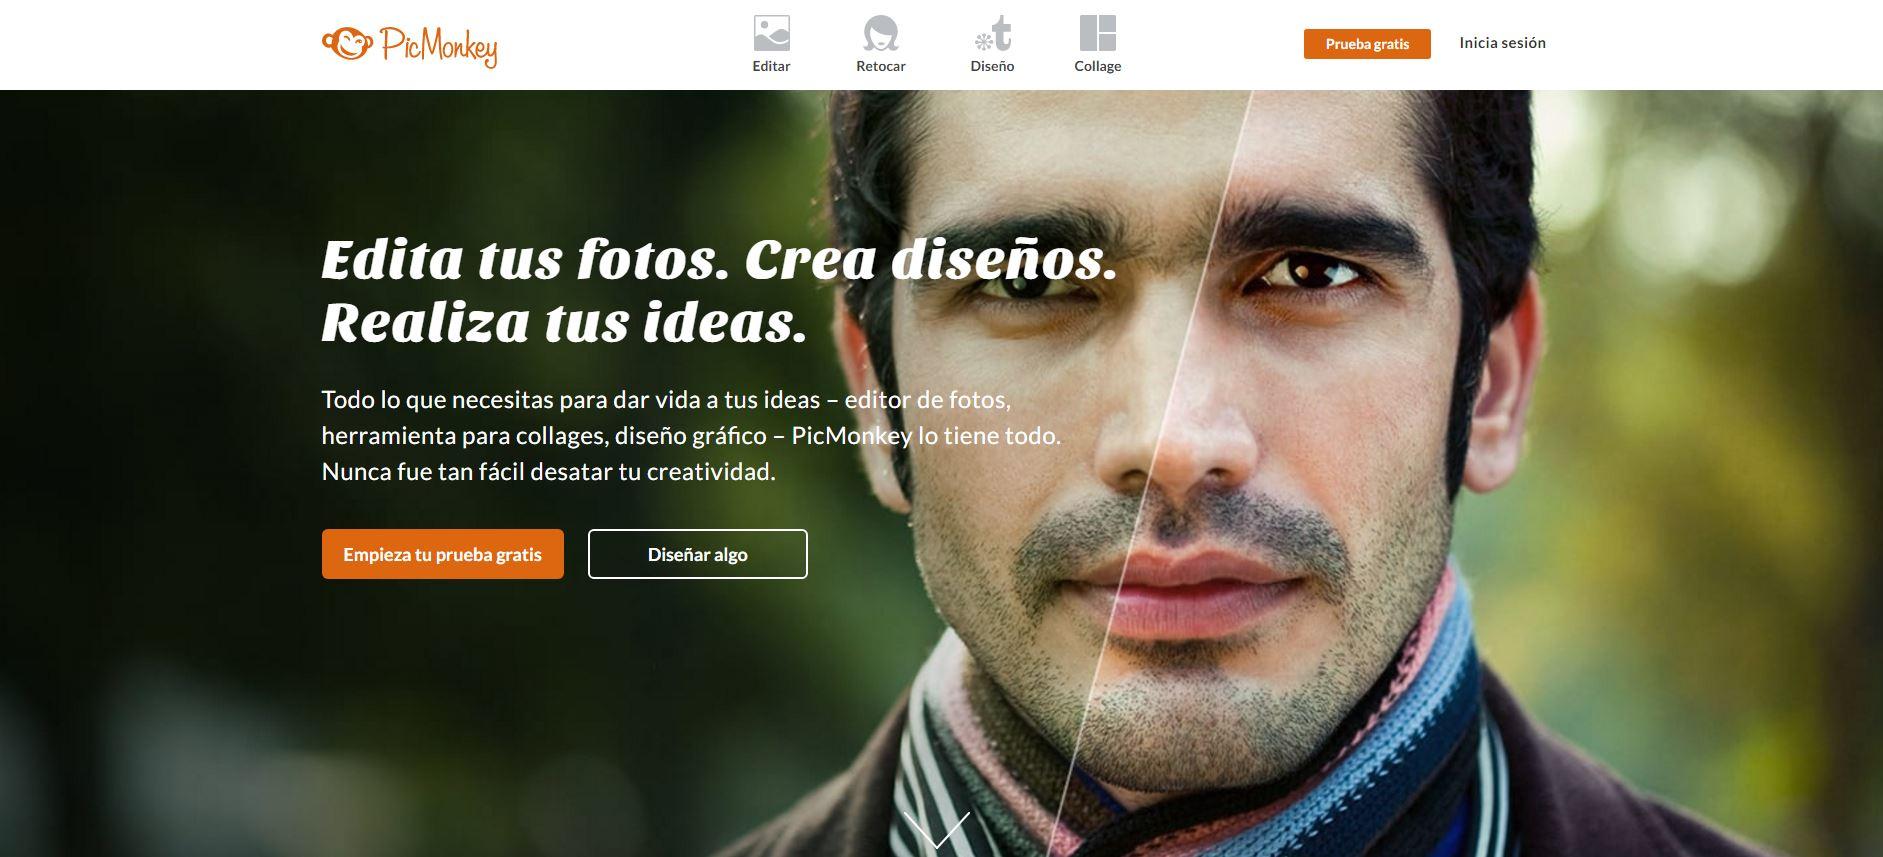 PicMonkey-crear imagenes online